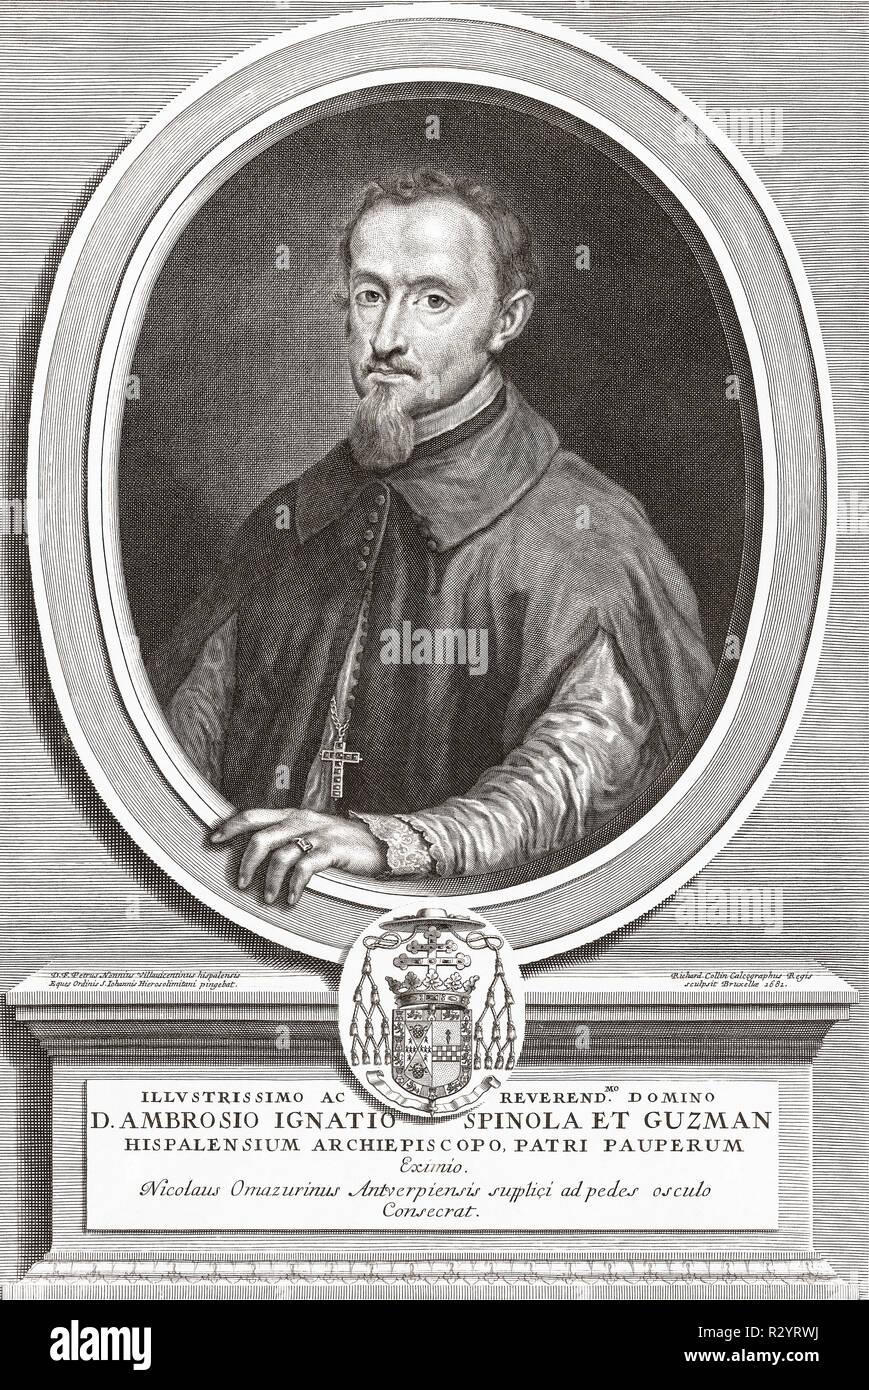 Ambrosio Ignacio Spínola y Guzmán, 1632-1684.  Spanish priest.  Bishop of Oviedo, then Archbishop of Valencia, then Archbishop of Santiago and finally Archbishop of Seville. - Stock Image